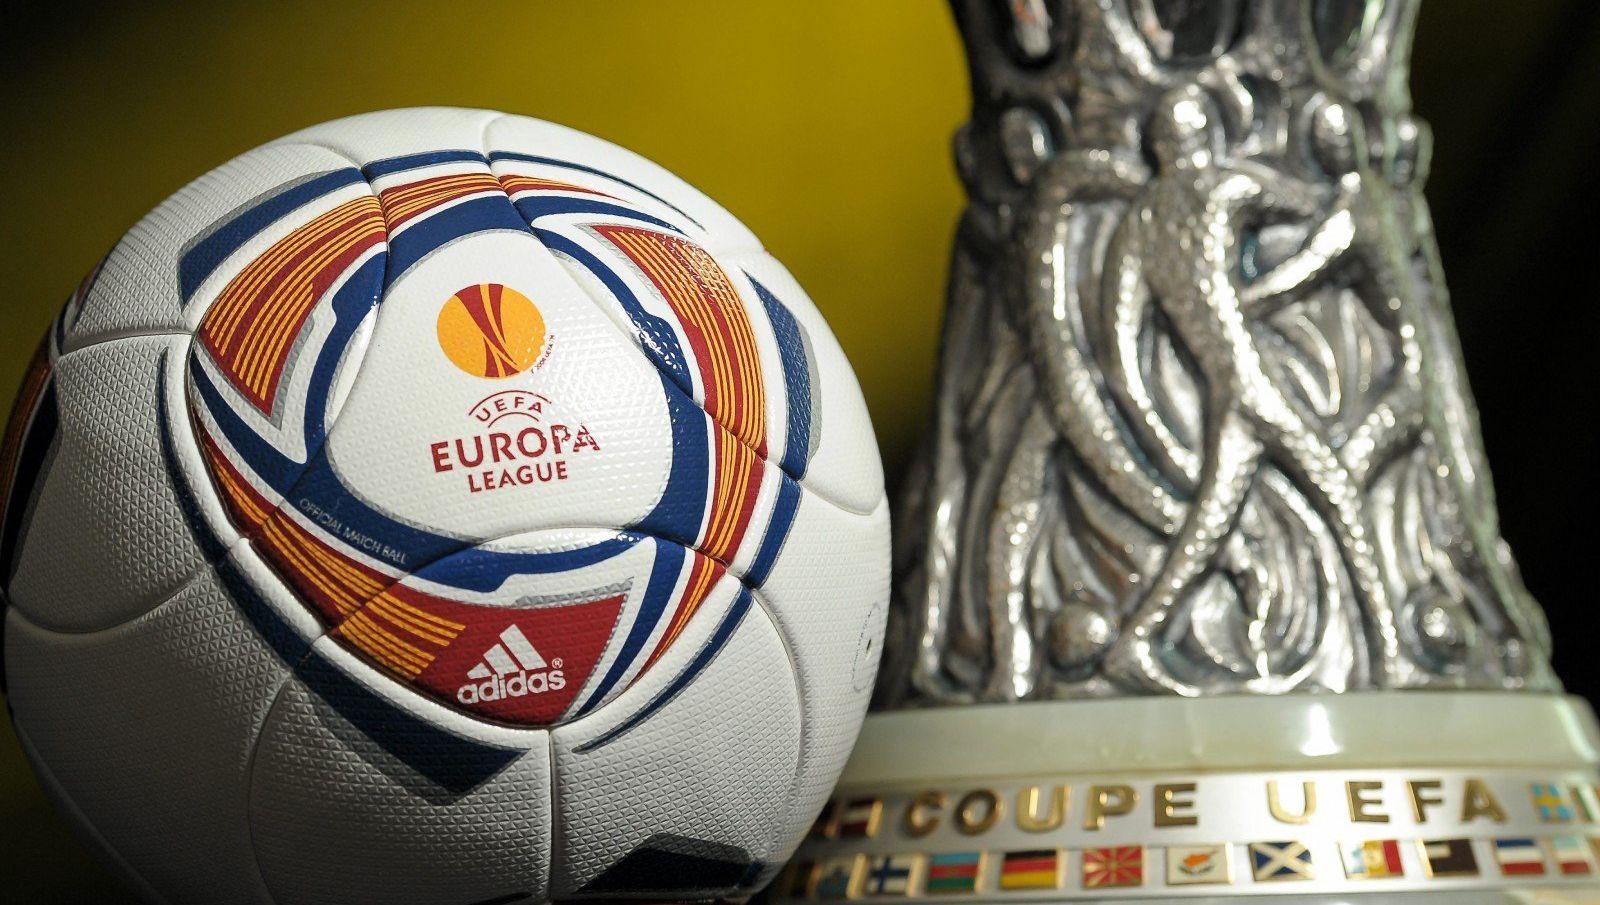 UEFA Europa League   Ticket Details